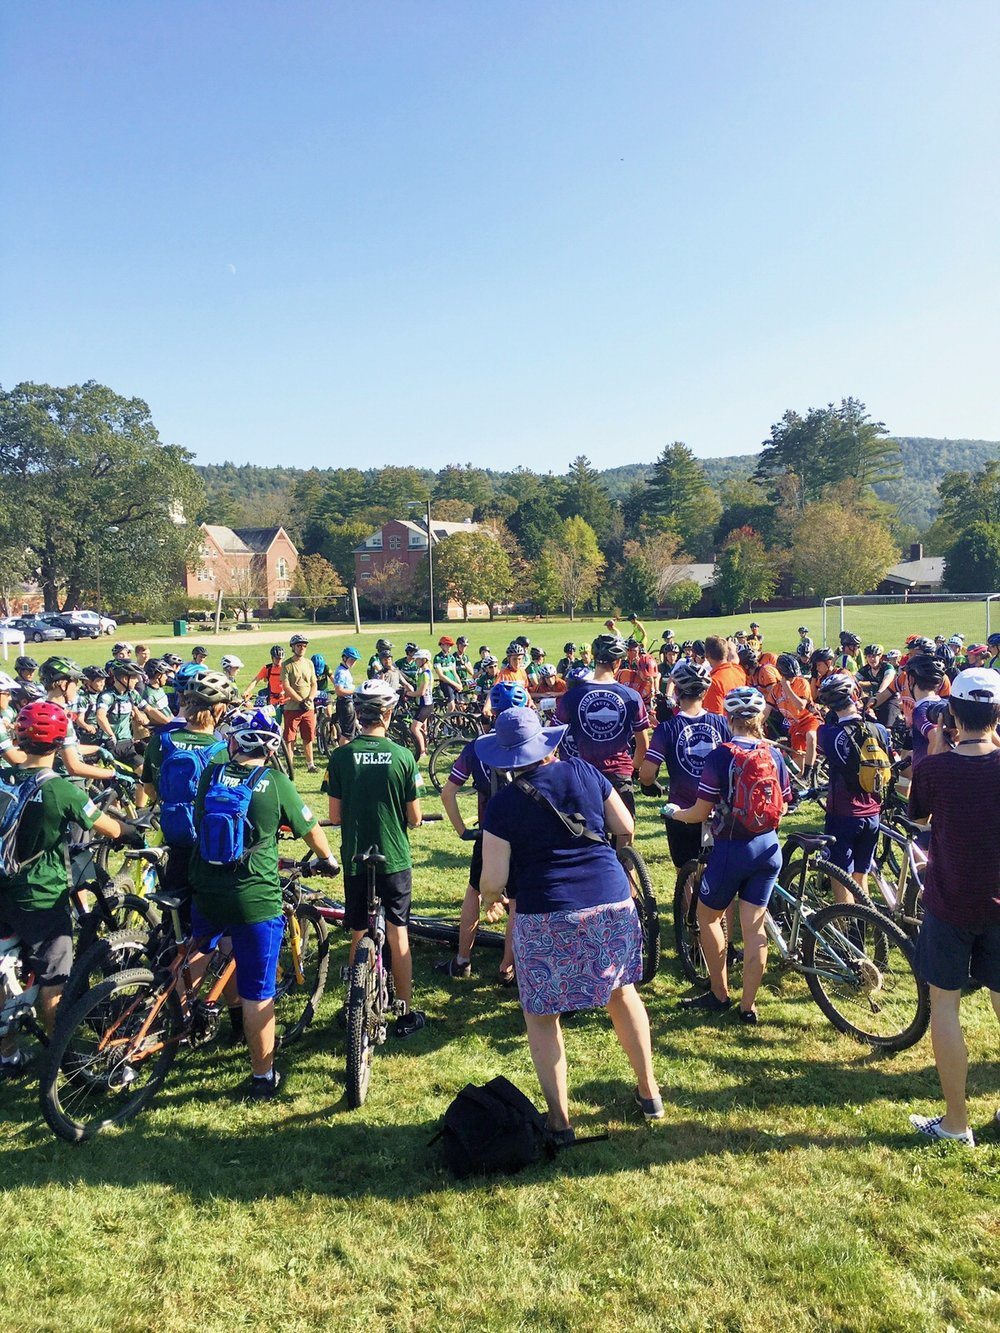 Mountain Biking at Vermont Academy - September 27, 2017  - 7923.JPG